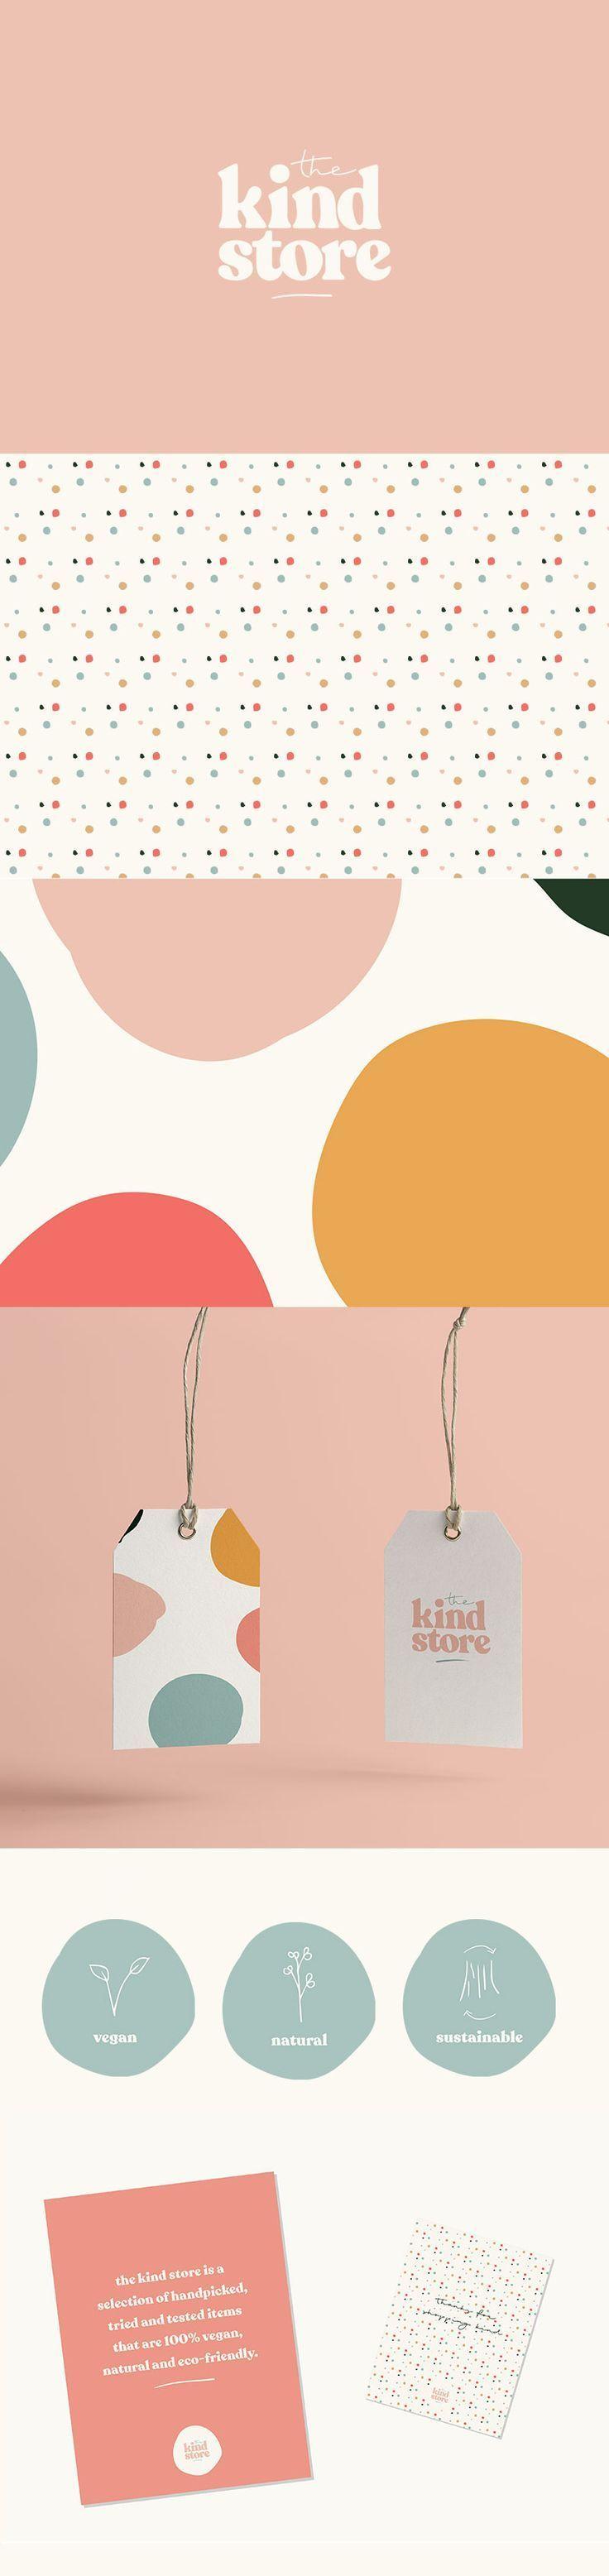 The Kind Store – Marca de belleza sostenible  – Corporate